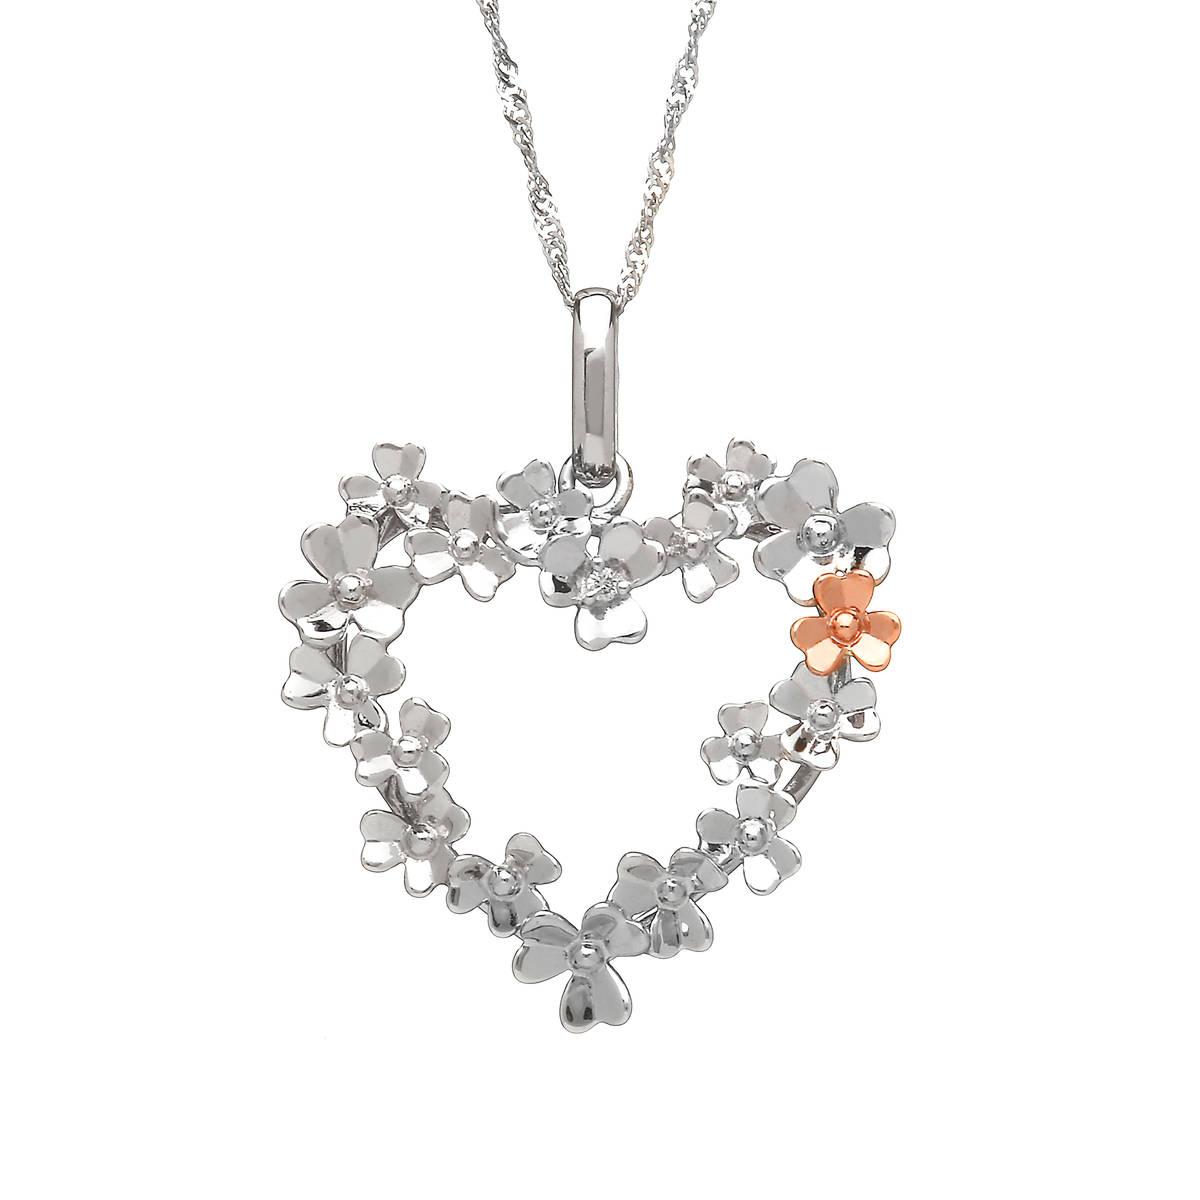 diamond set 9 carat white gold love shamrock large open heart wreath pendant with one rare Irish rose gold flower.